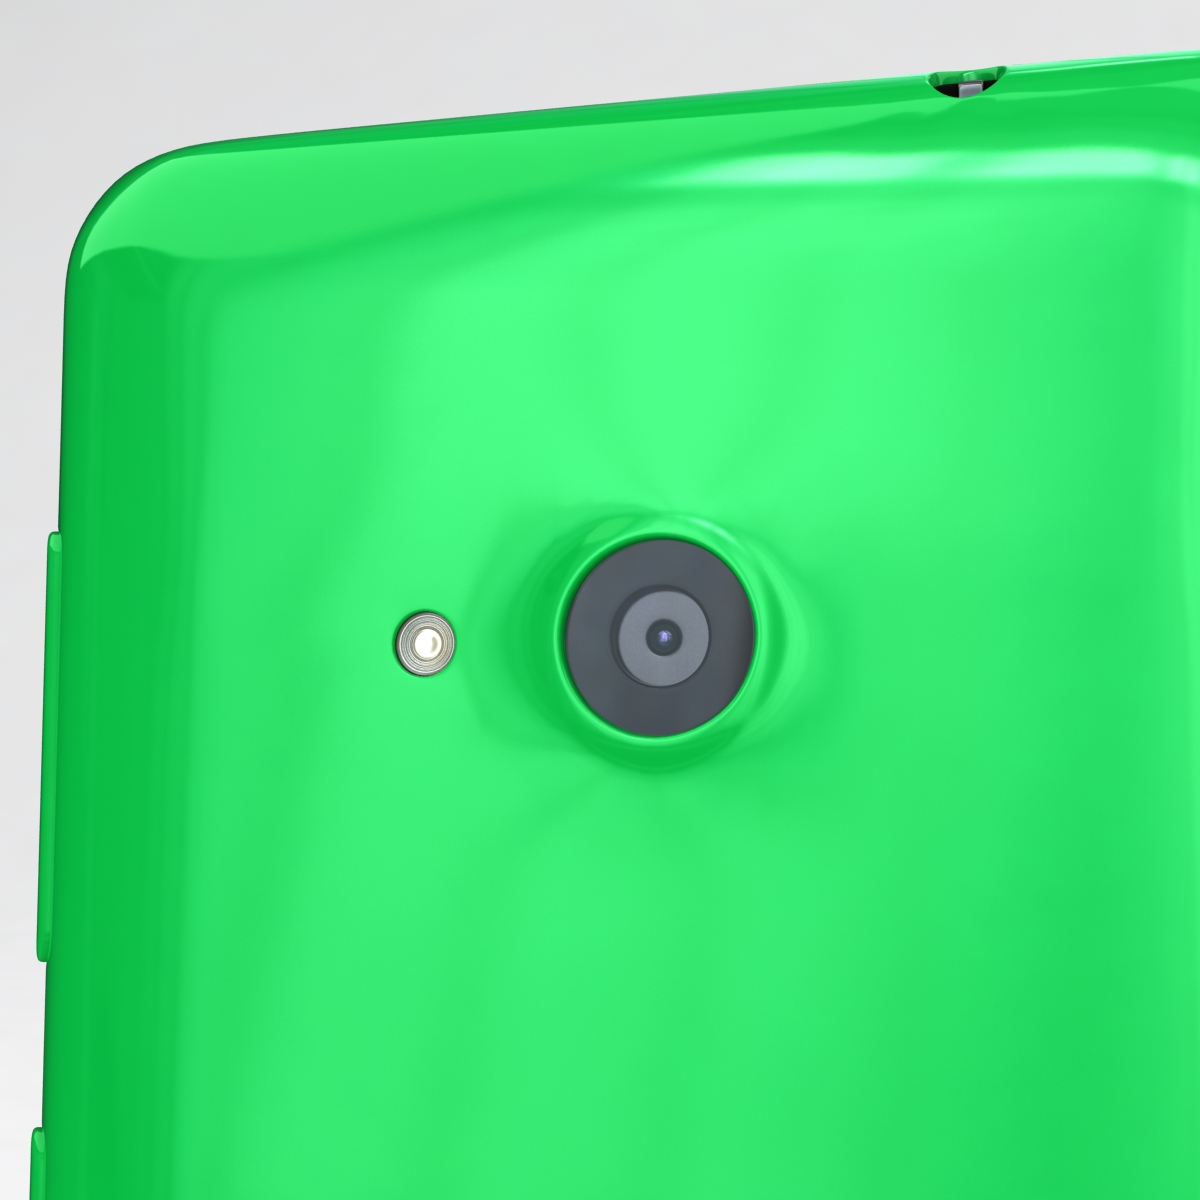 microsoft lumia 535 and dual sim green 3d model 3ds max fbx c4d obj 204178